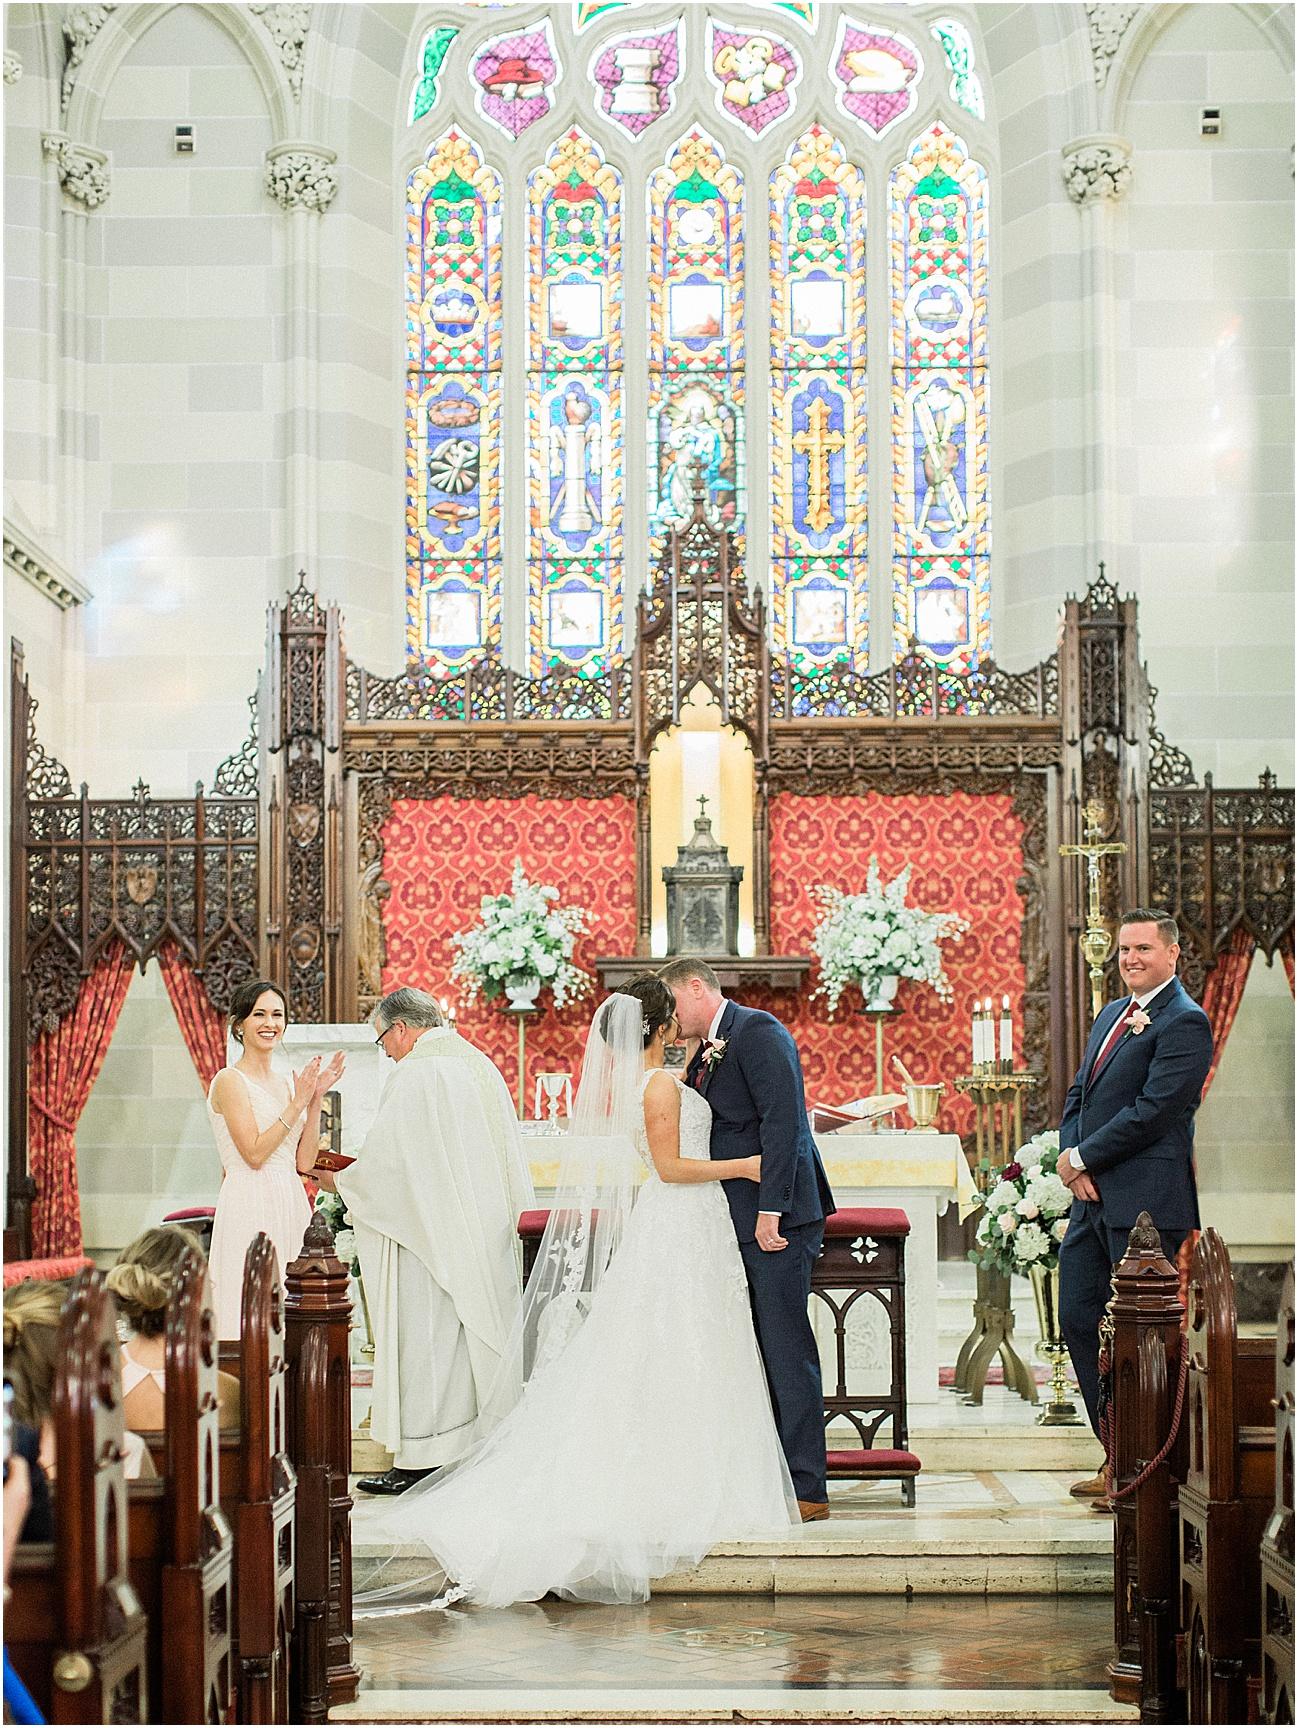 shannon_daniel_dan_atlantic_resort_saint_marys_st_mary_church_fall_newport_catholic_irish_cape_cod_boston_wedding_photographer_meredith_jane_photography_photo_1620.jpg